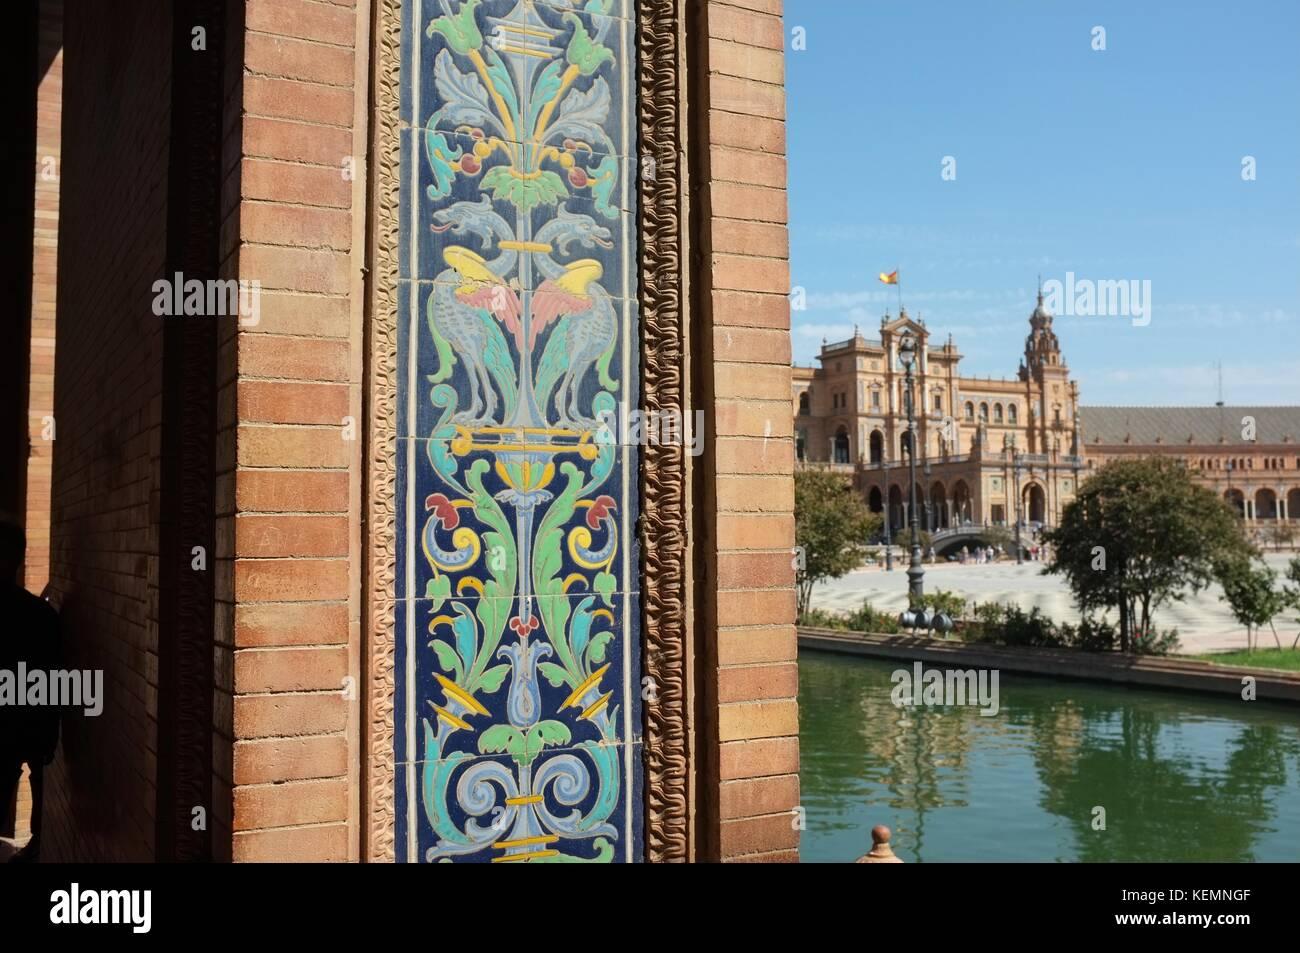 Plaza de España (completed 1928), Seville/Sevilla, Andalucia, Spain, September 2017 - Stock Image